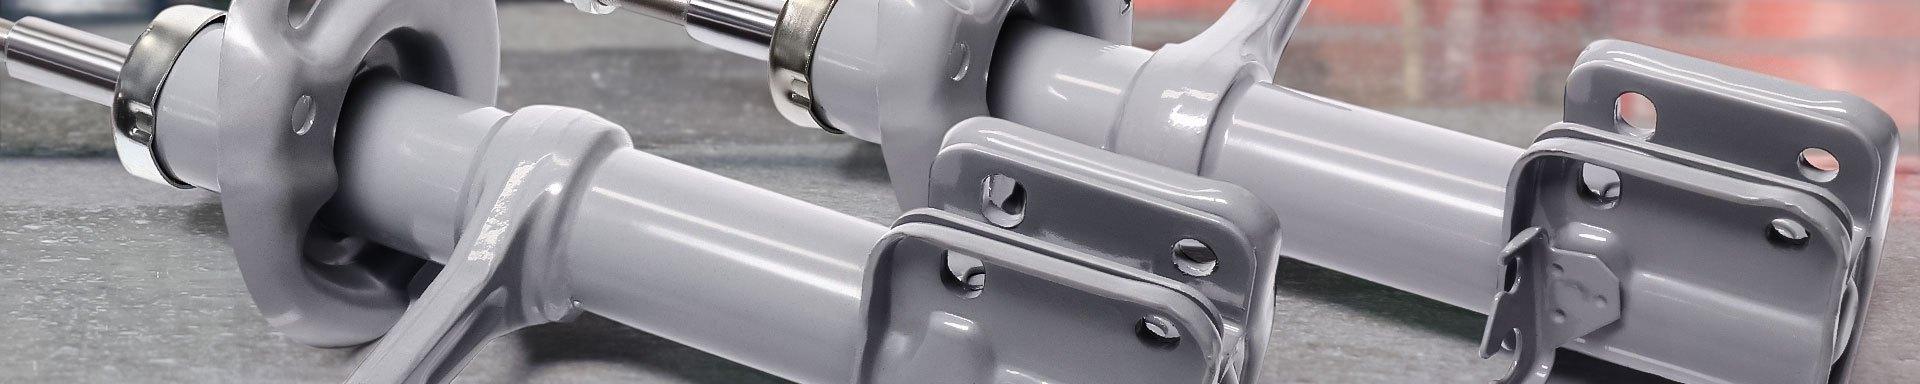 Replacement Suspension Parts